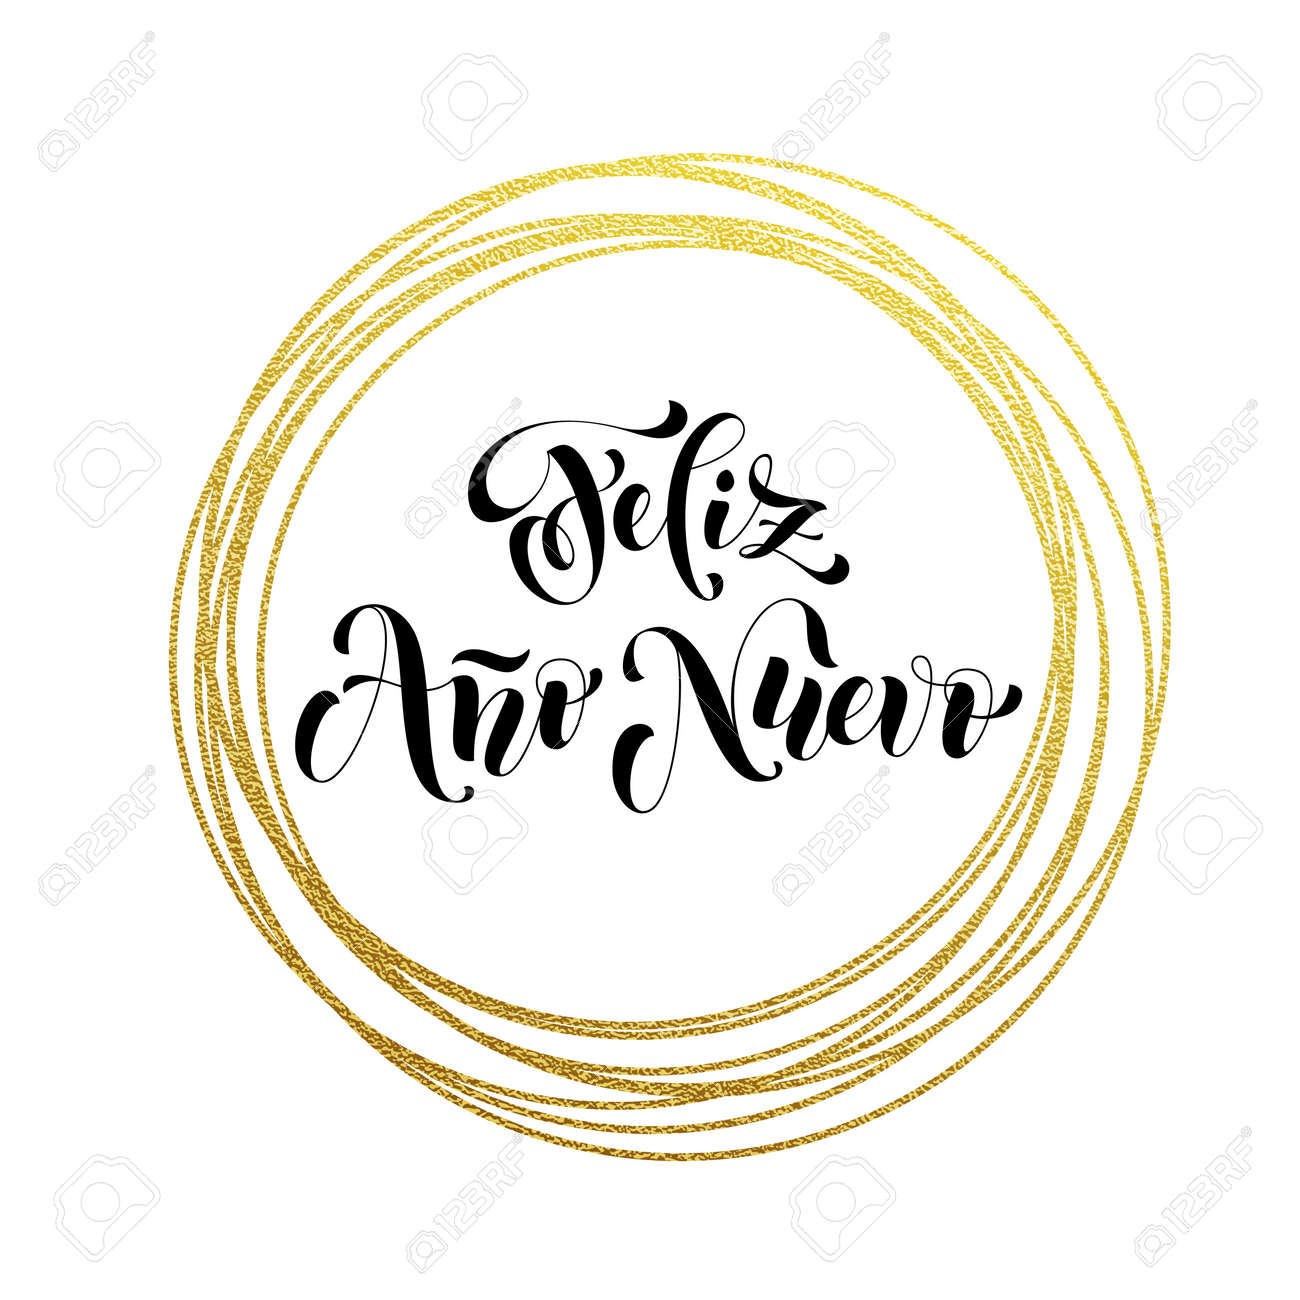 Feliz ano nuevo spanish happy new year luxury golden greeting feliz ano nuevo spanish happy new year luxury golden greeting card of golden glitter decoration m4hsunfo Choice Image